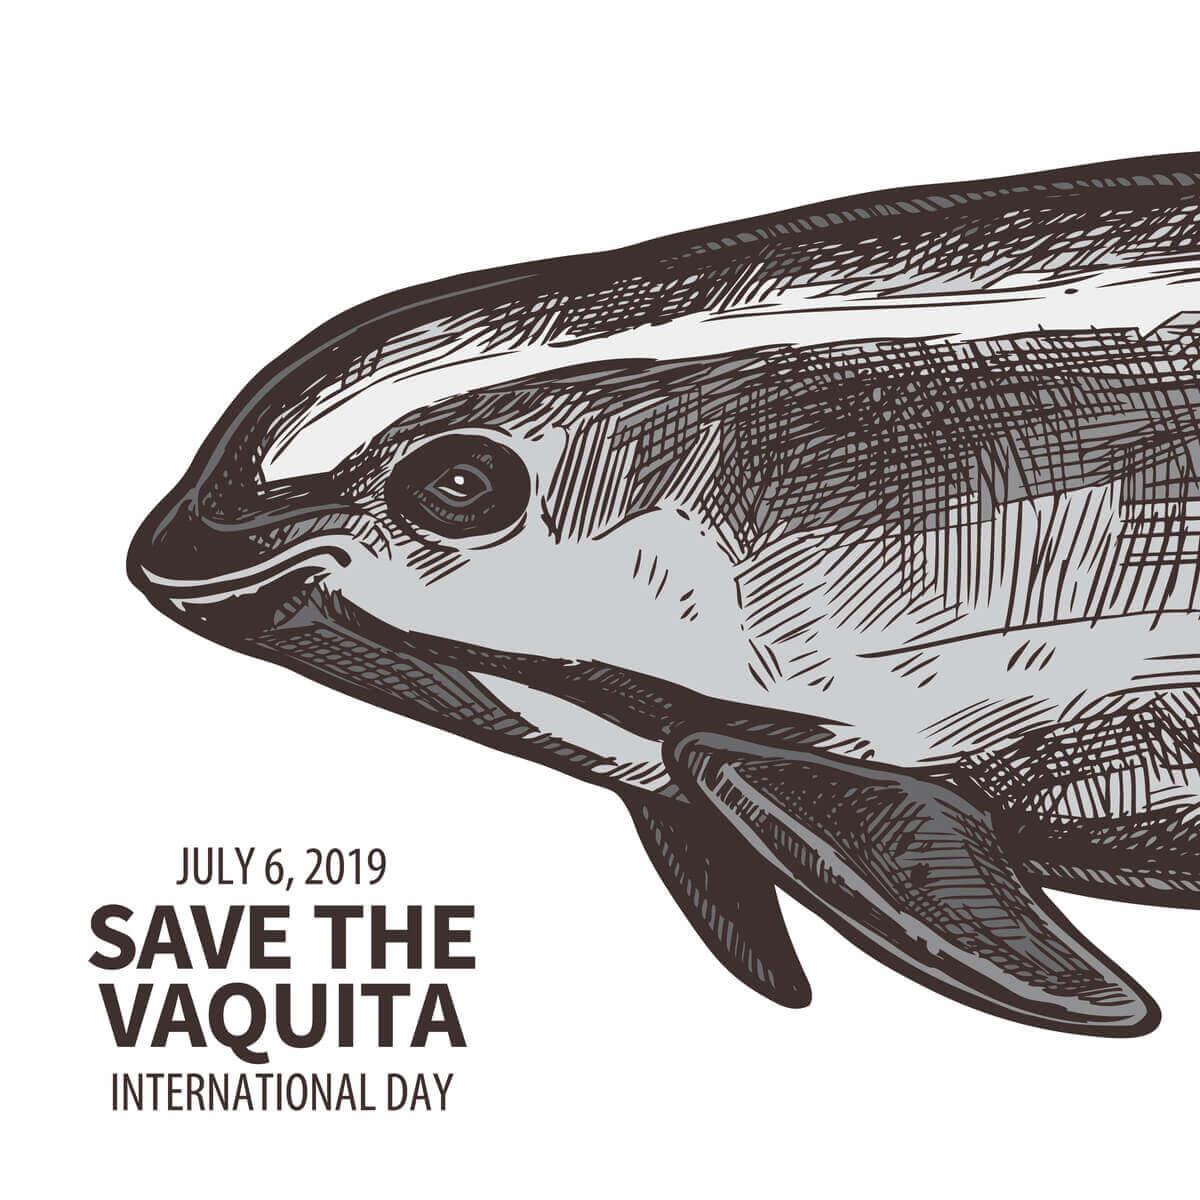 Save the vaquita.